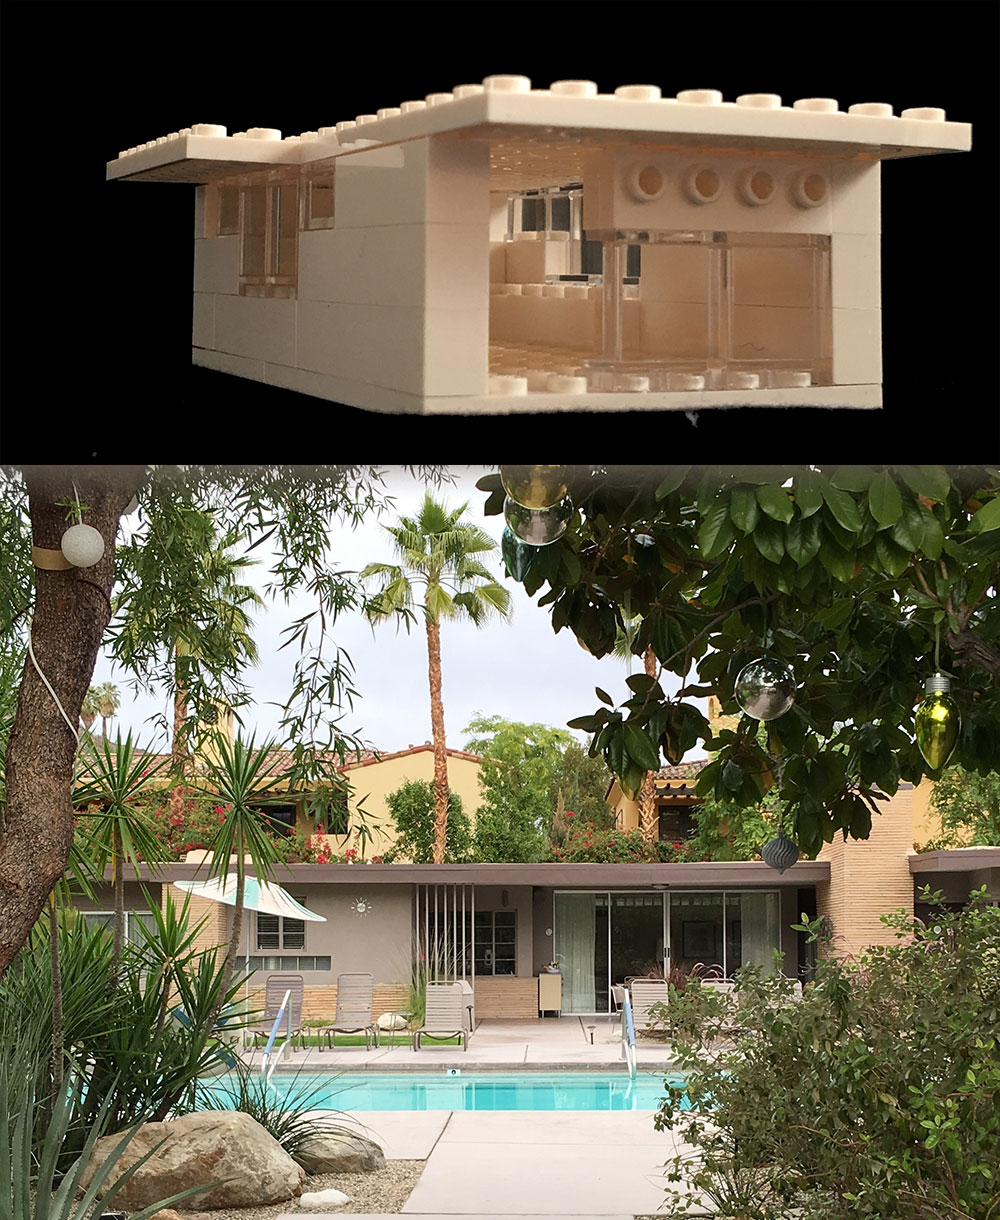 Modernist house and lego house